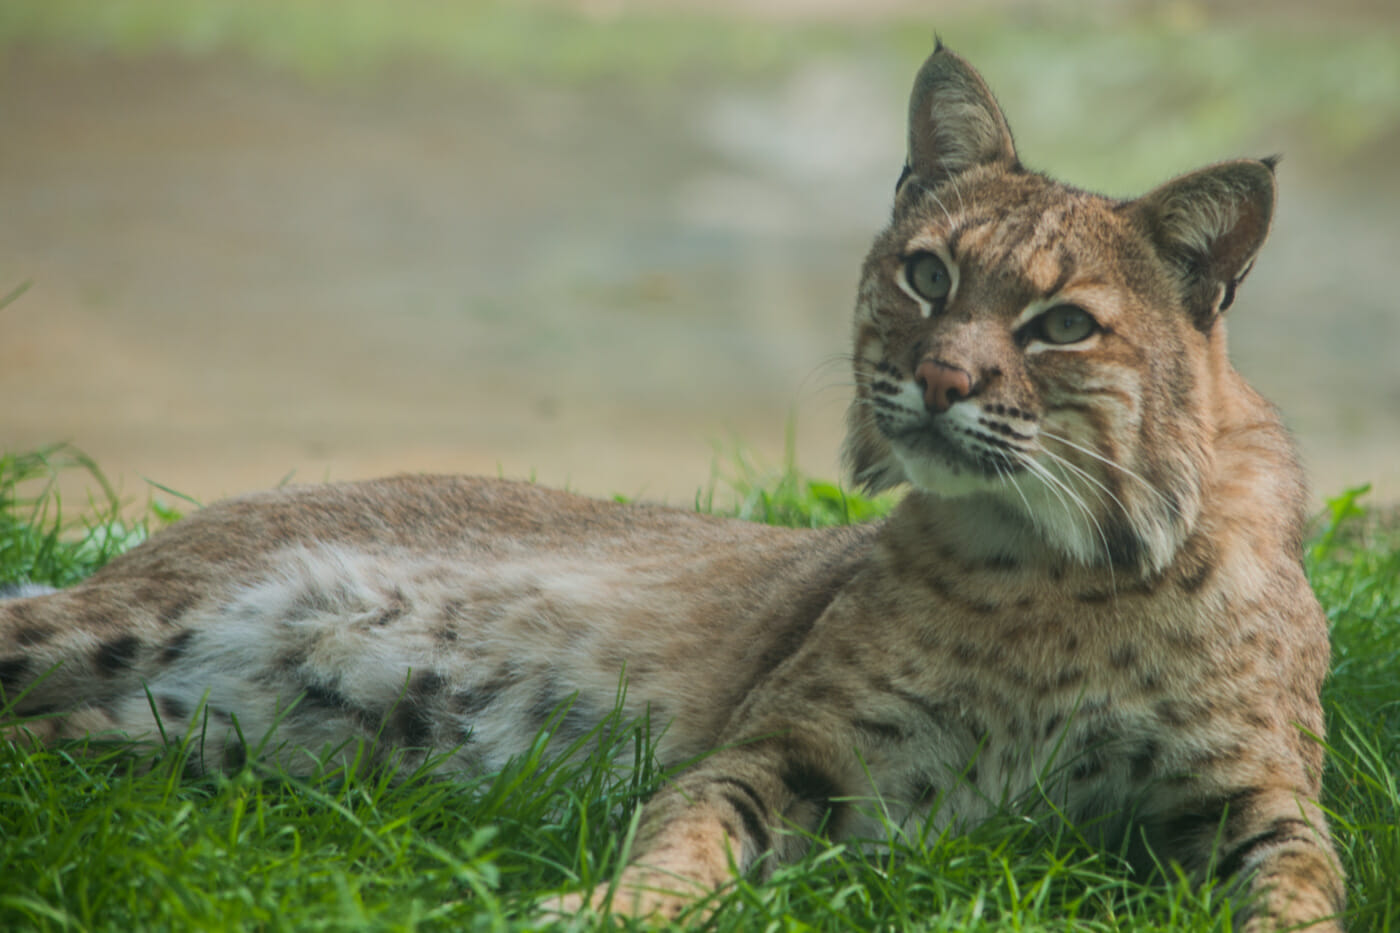 Bobcat in grass